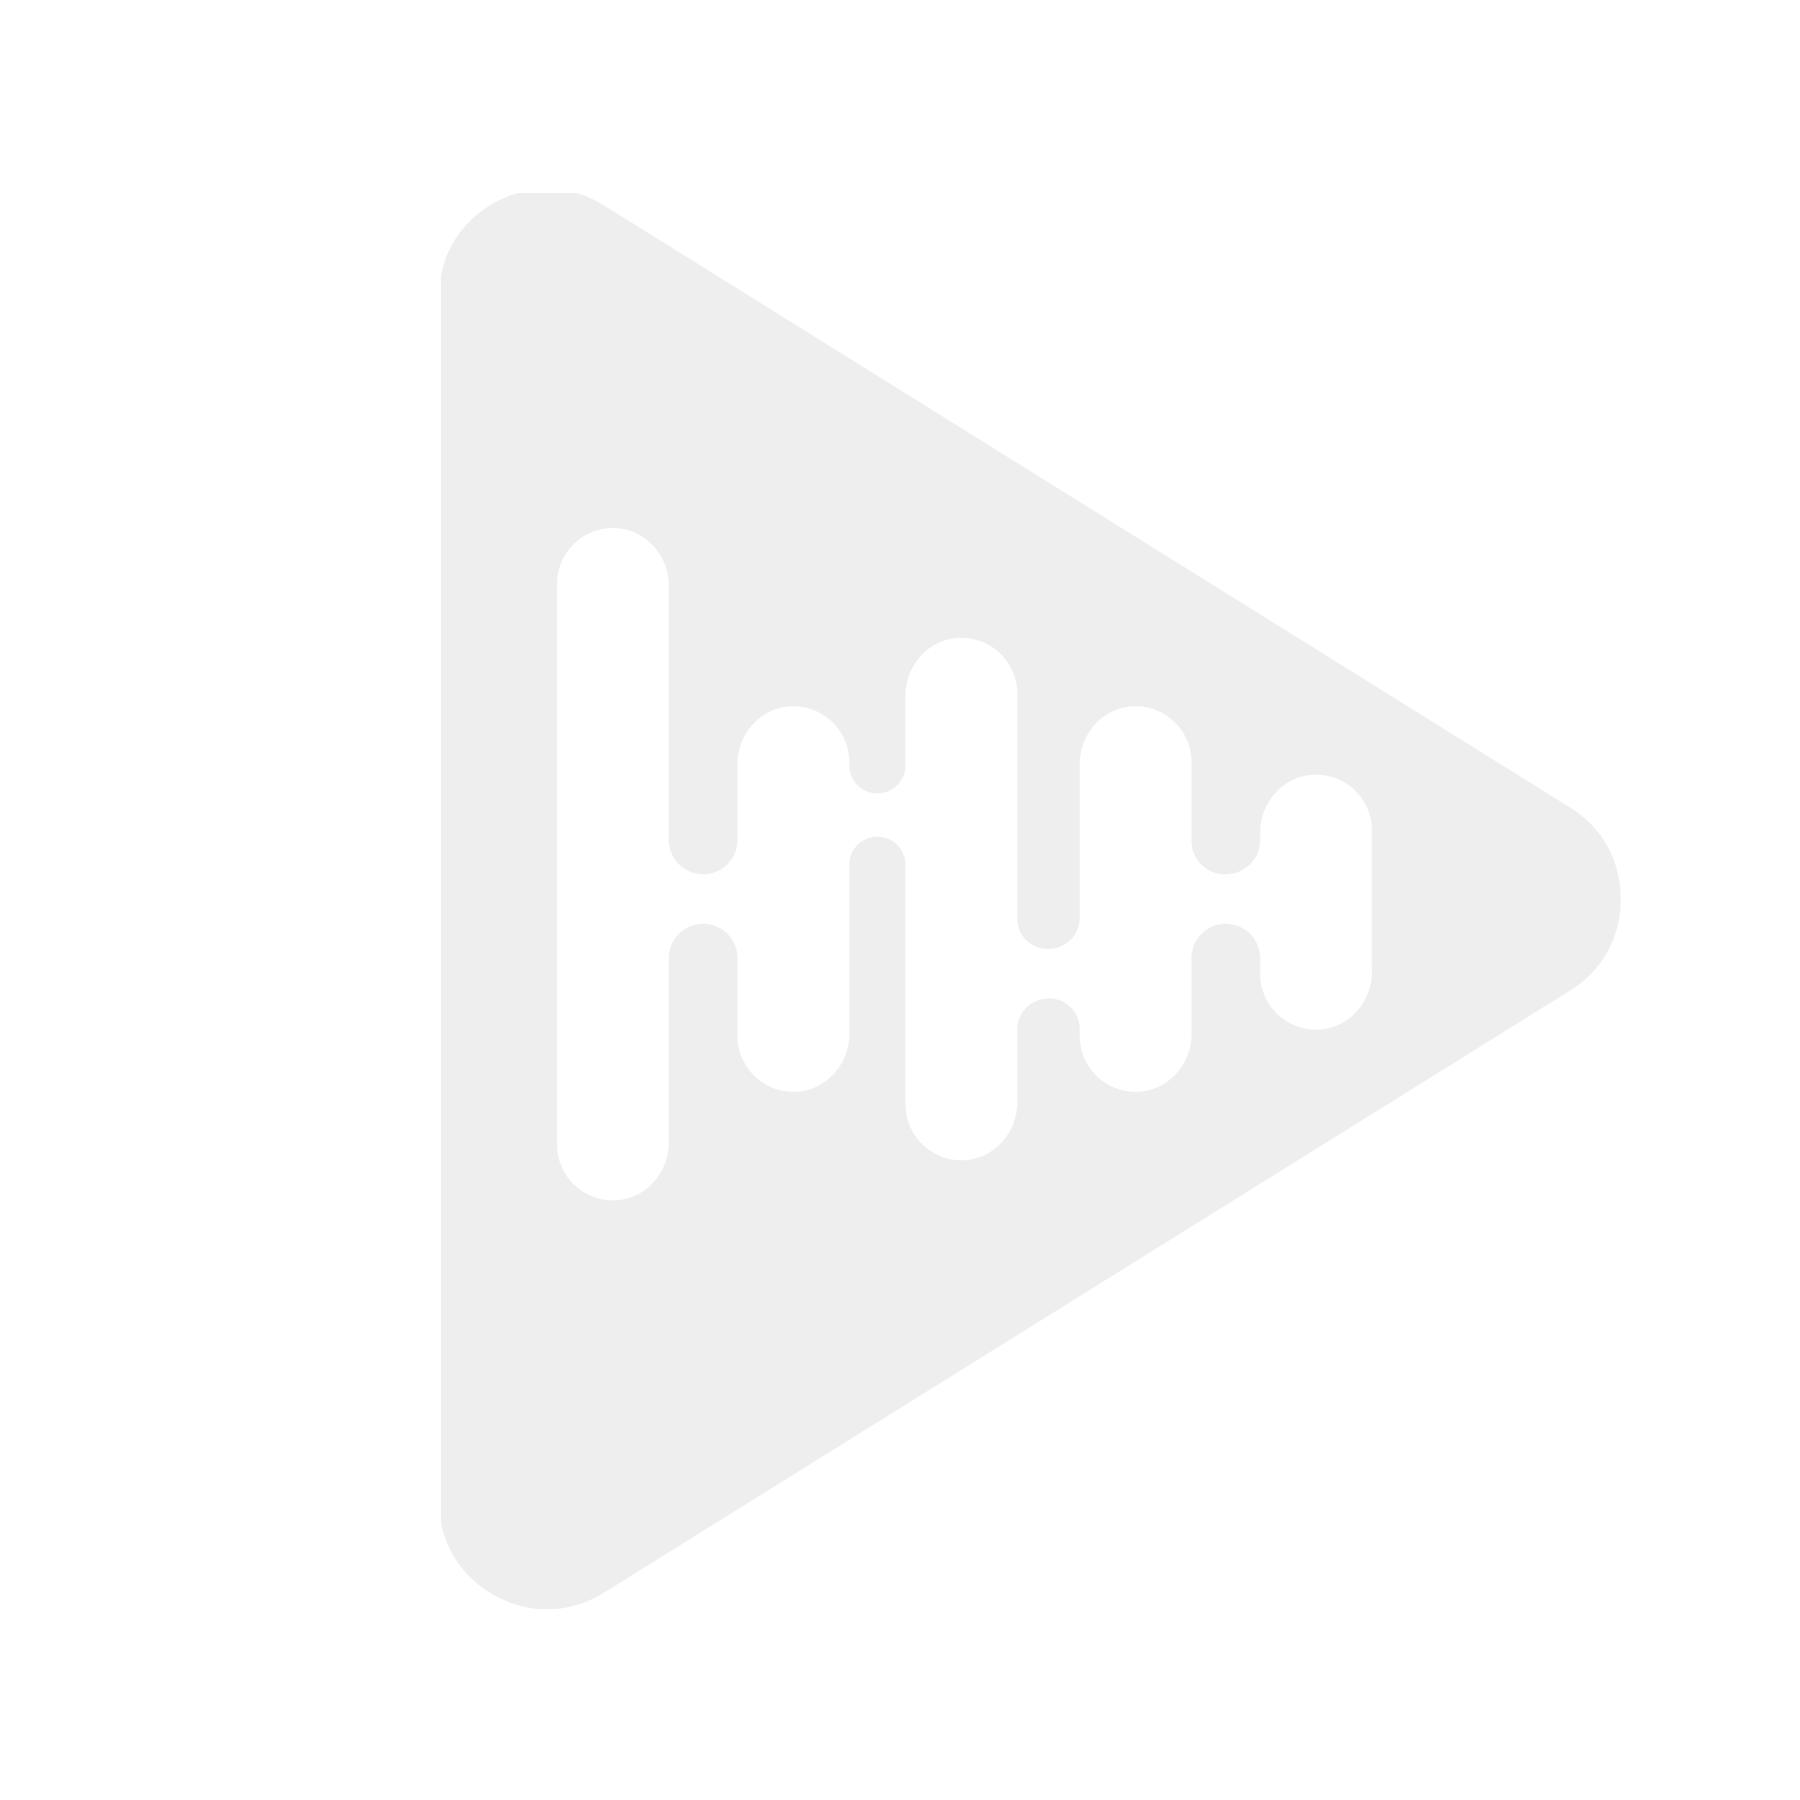 Klipsch 1011978